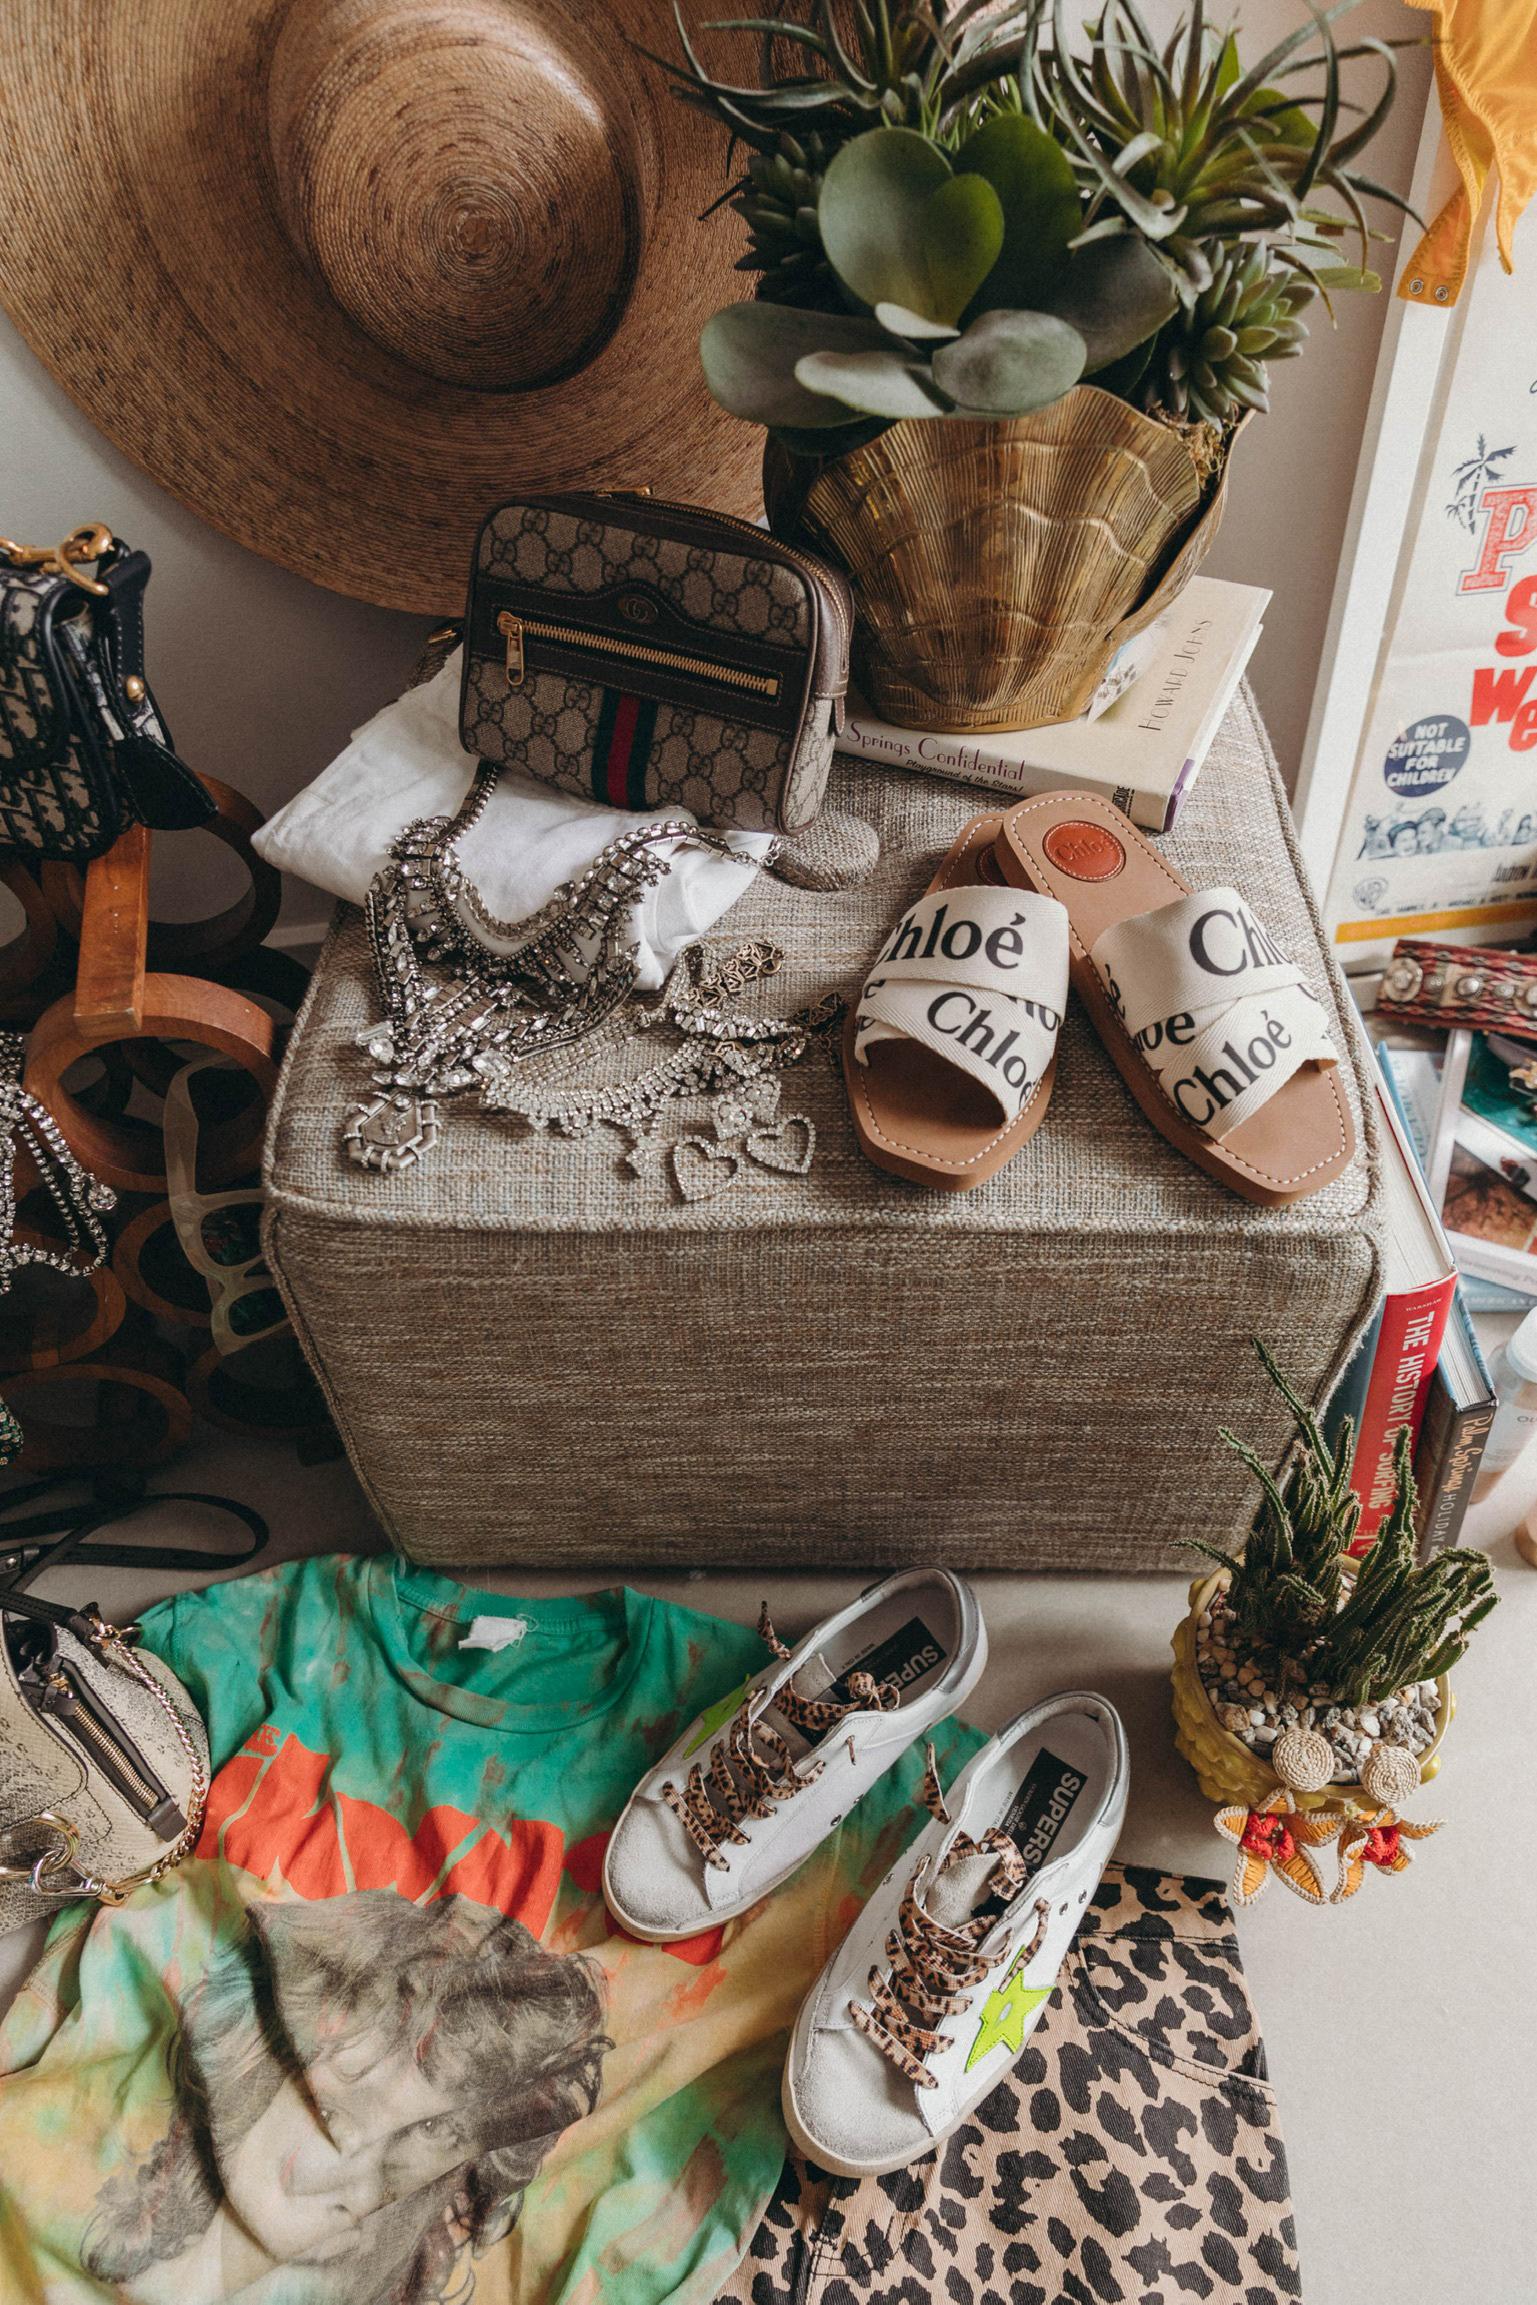 Collage Vintage Festival closet for Coachella